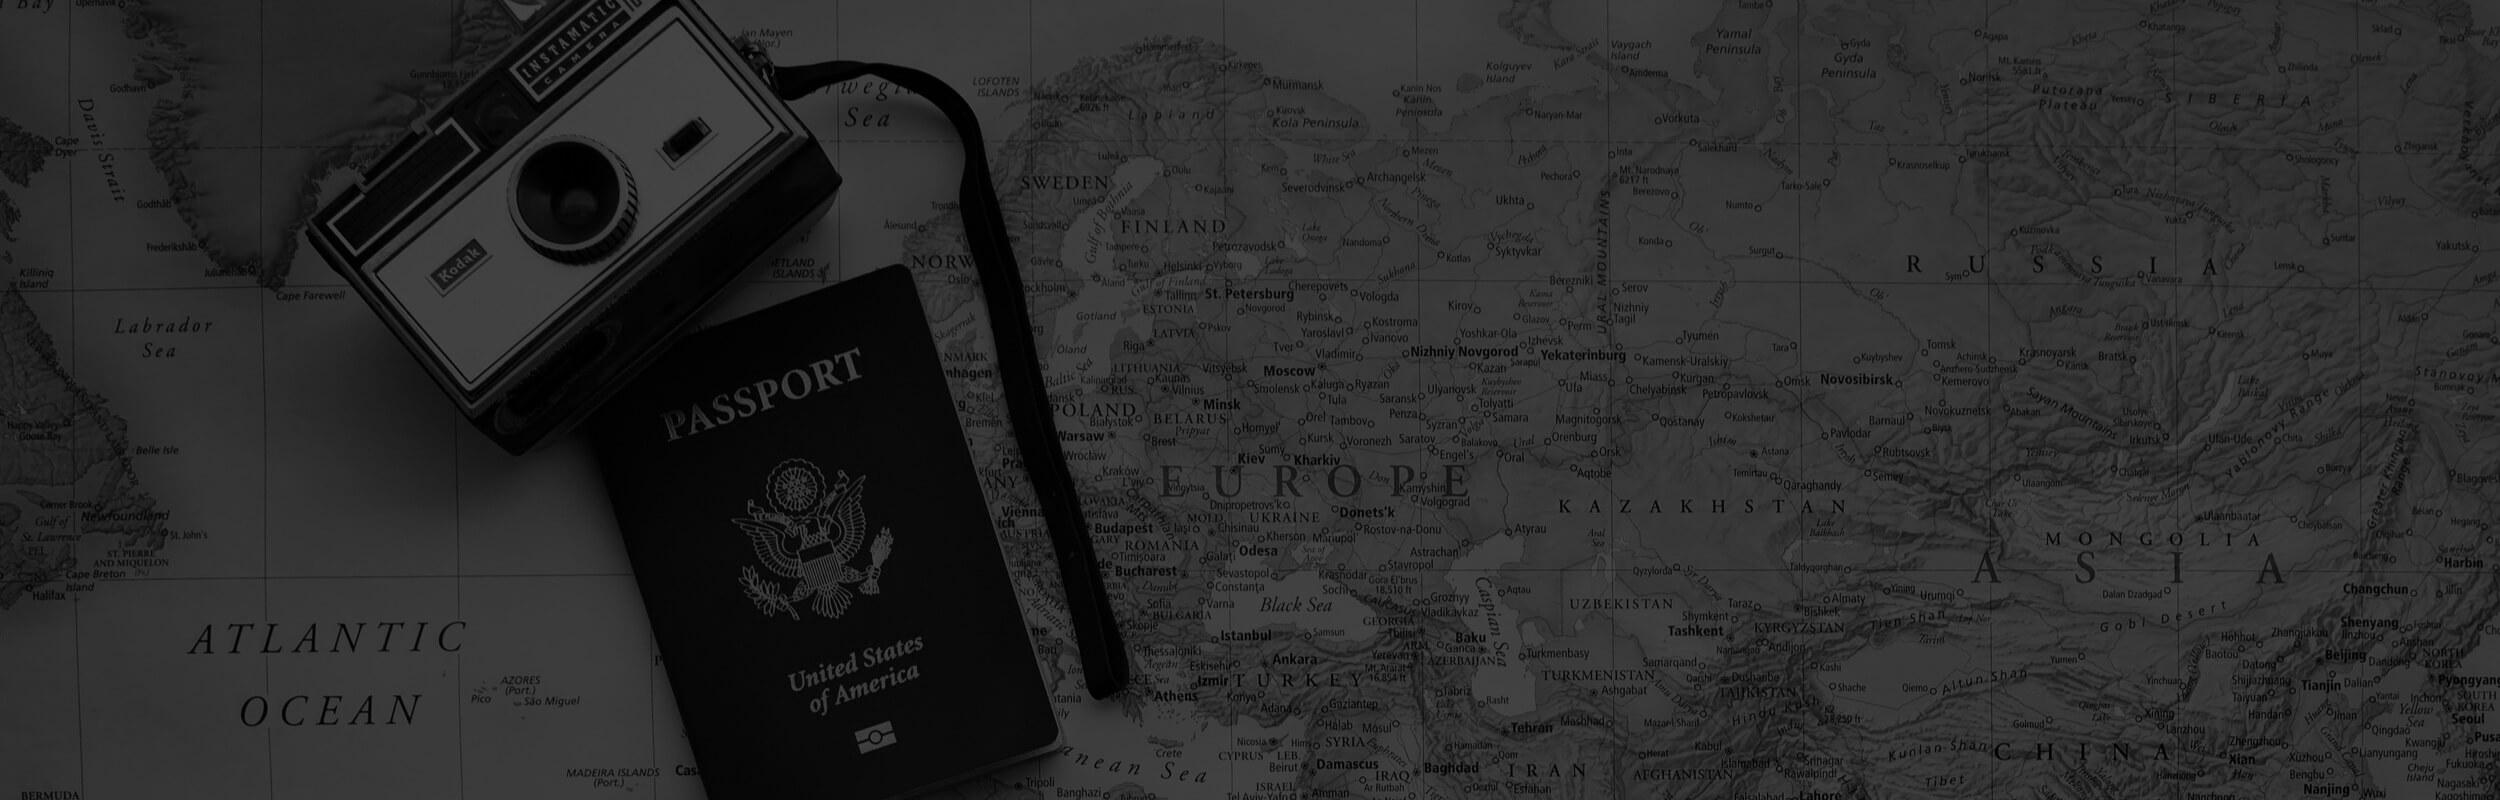 Foťák a pas položený na mape